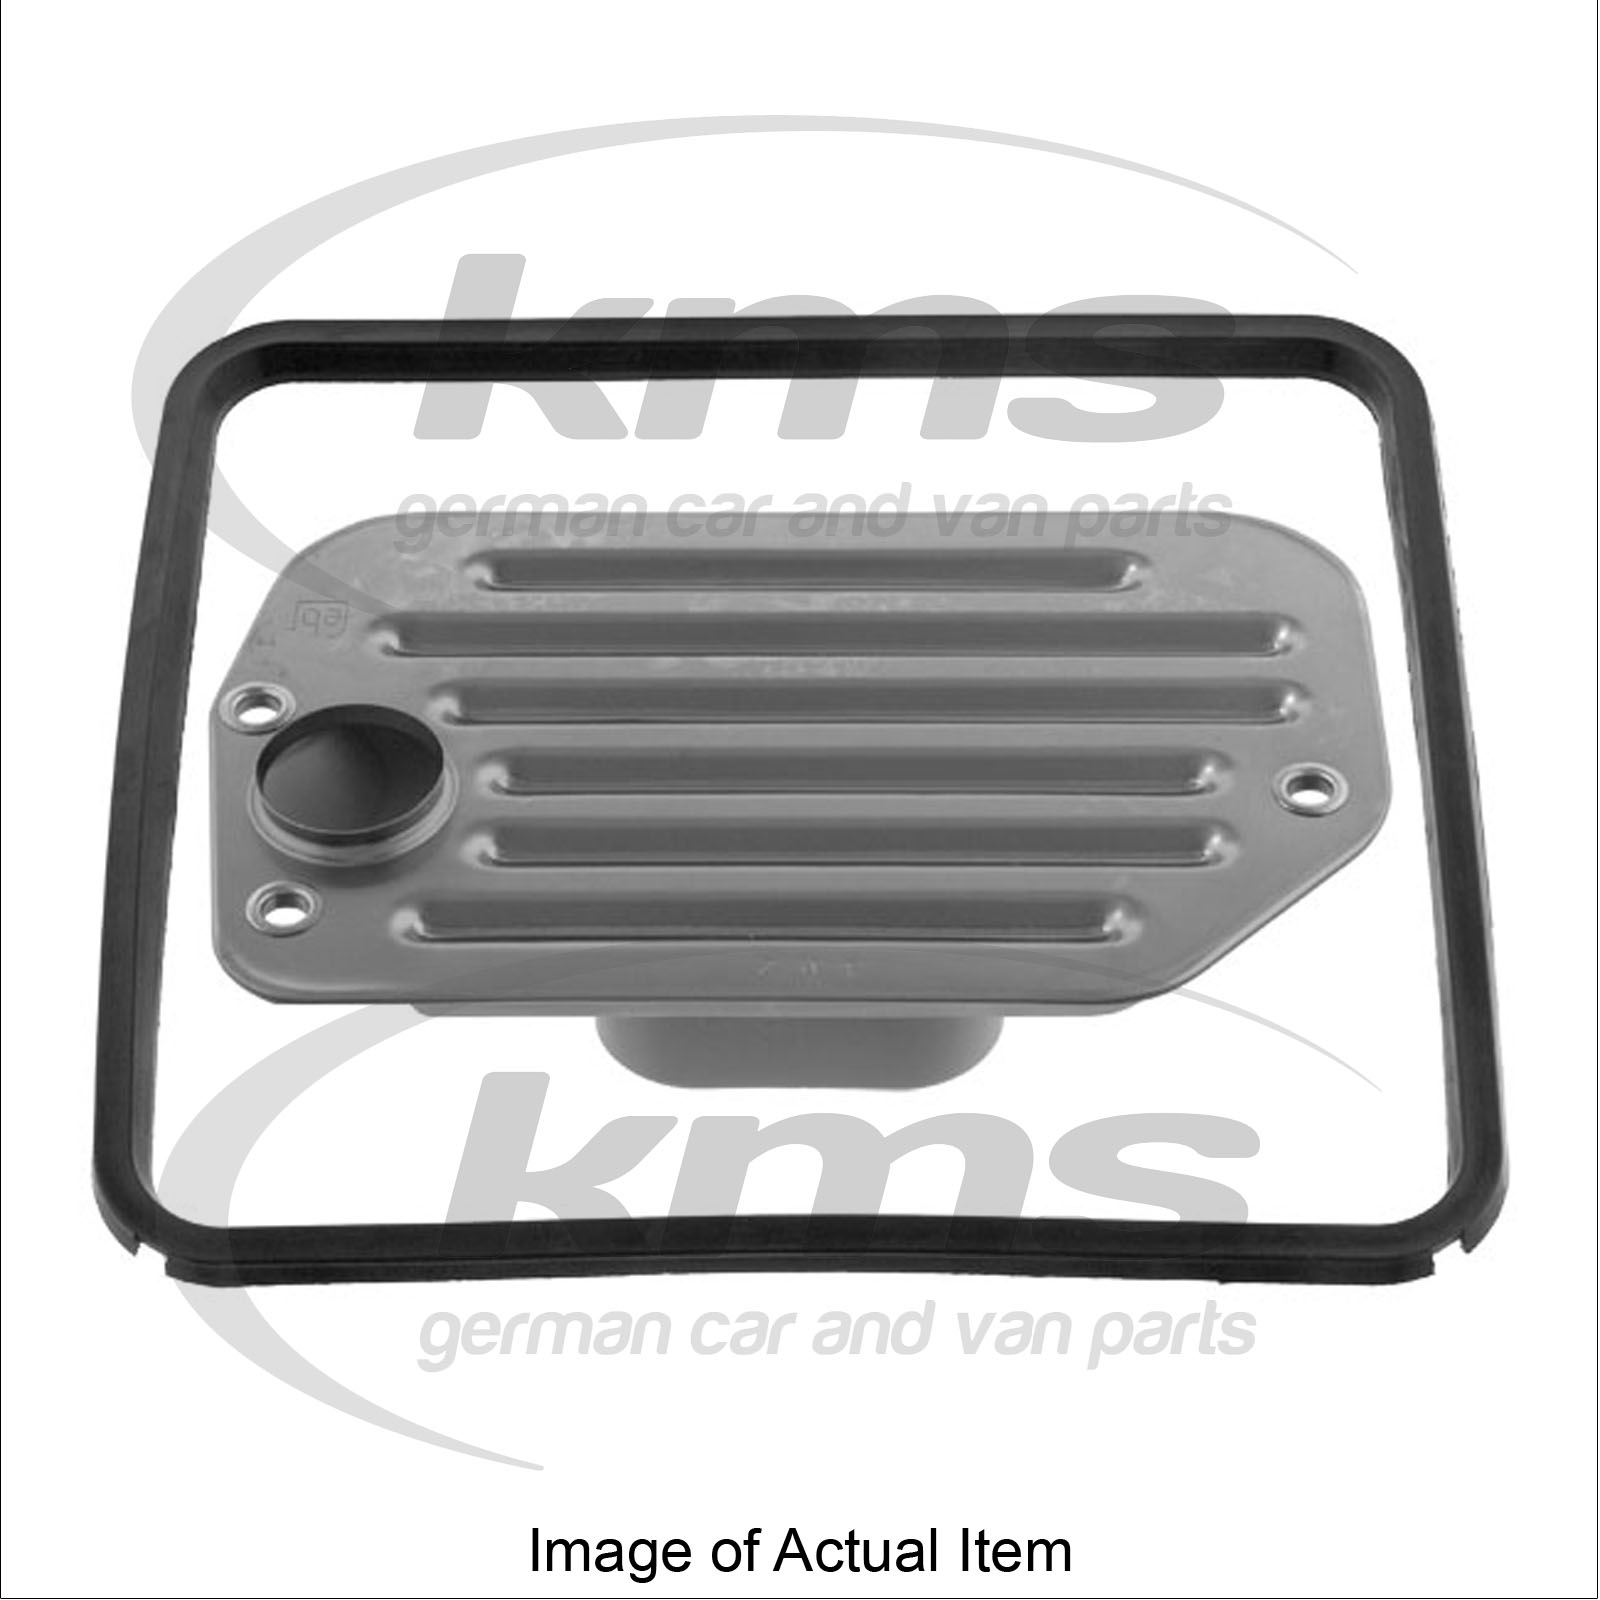 Transmission oil strainer kit audi a6 estate avant c4 for Audi a6 motor oil